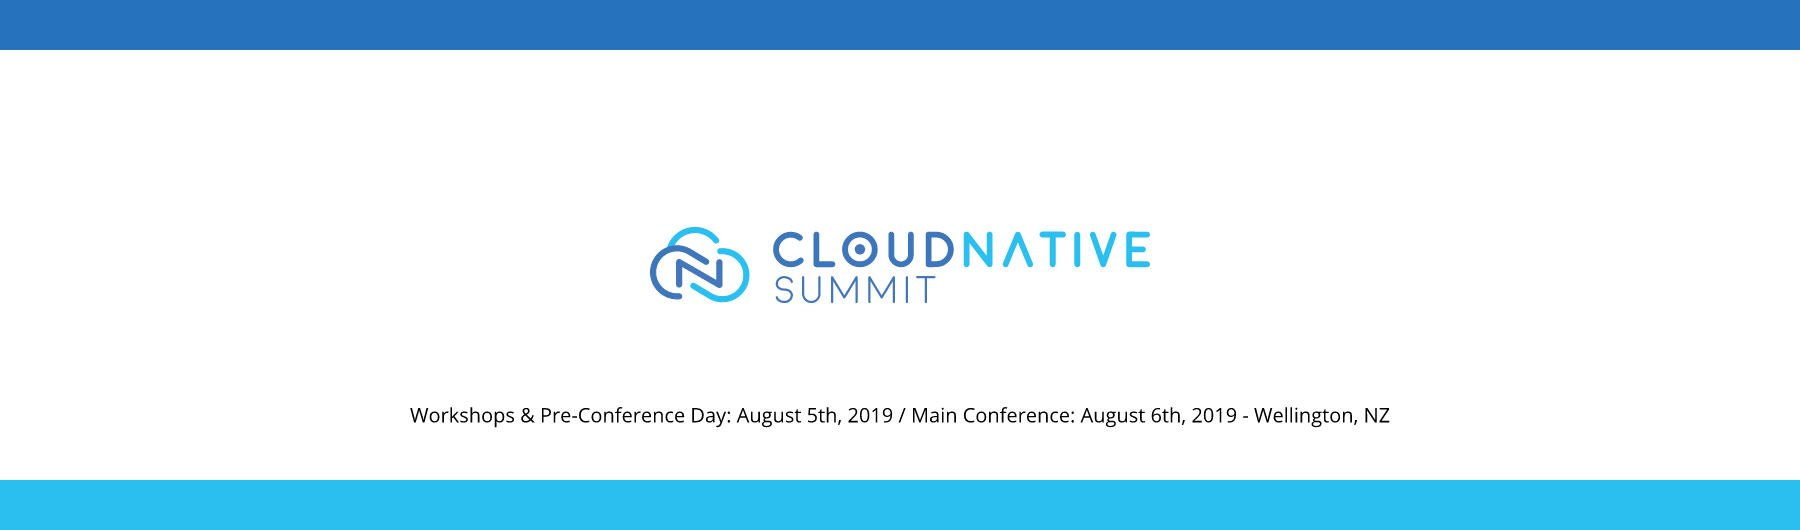 Cloud Native Summit 2019 - Wellington